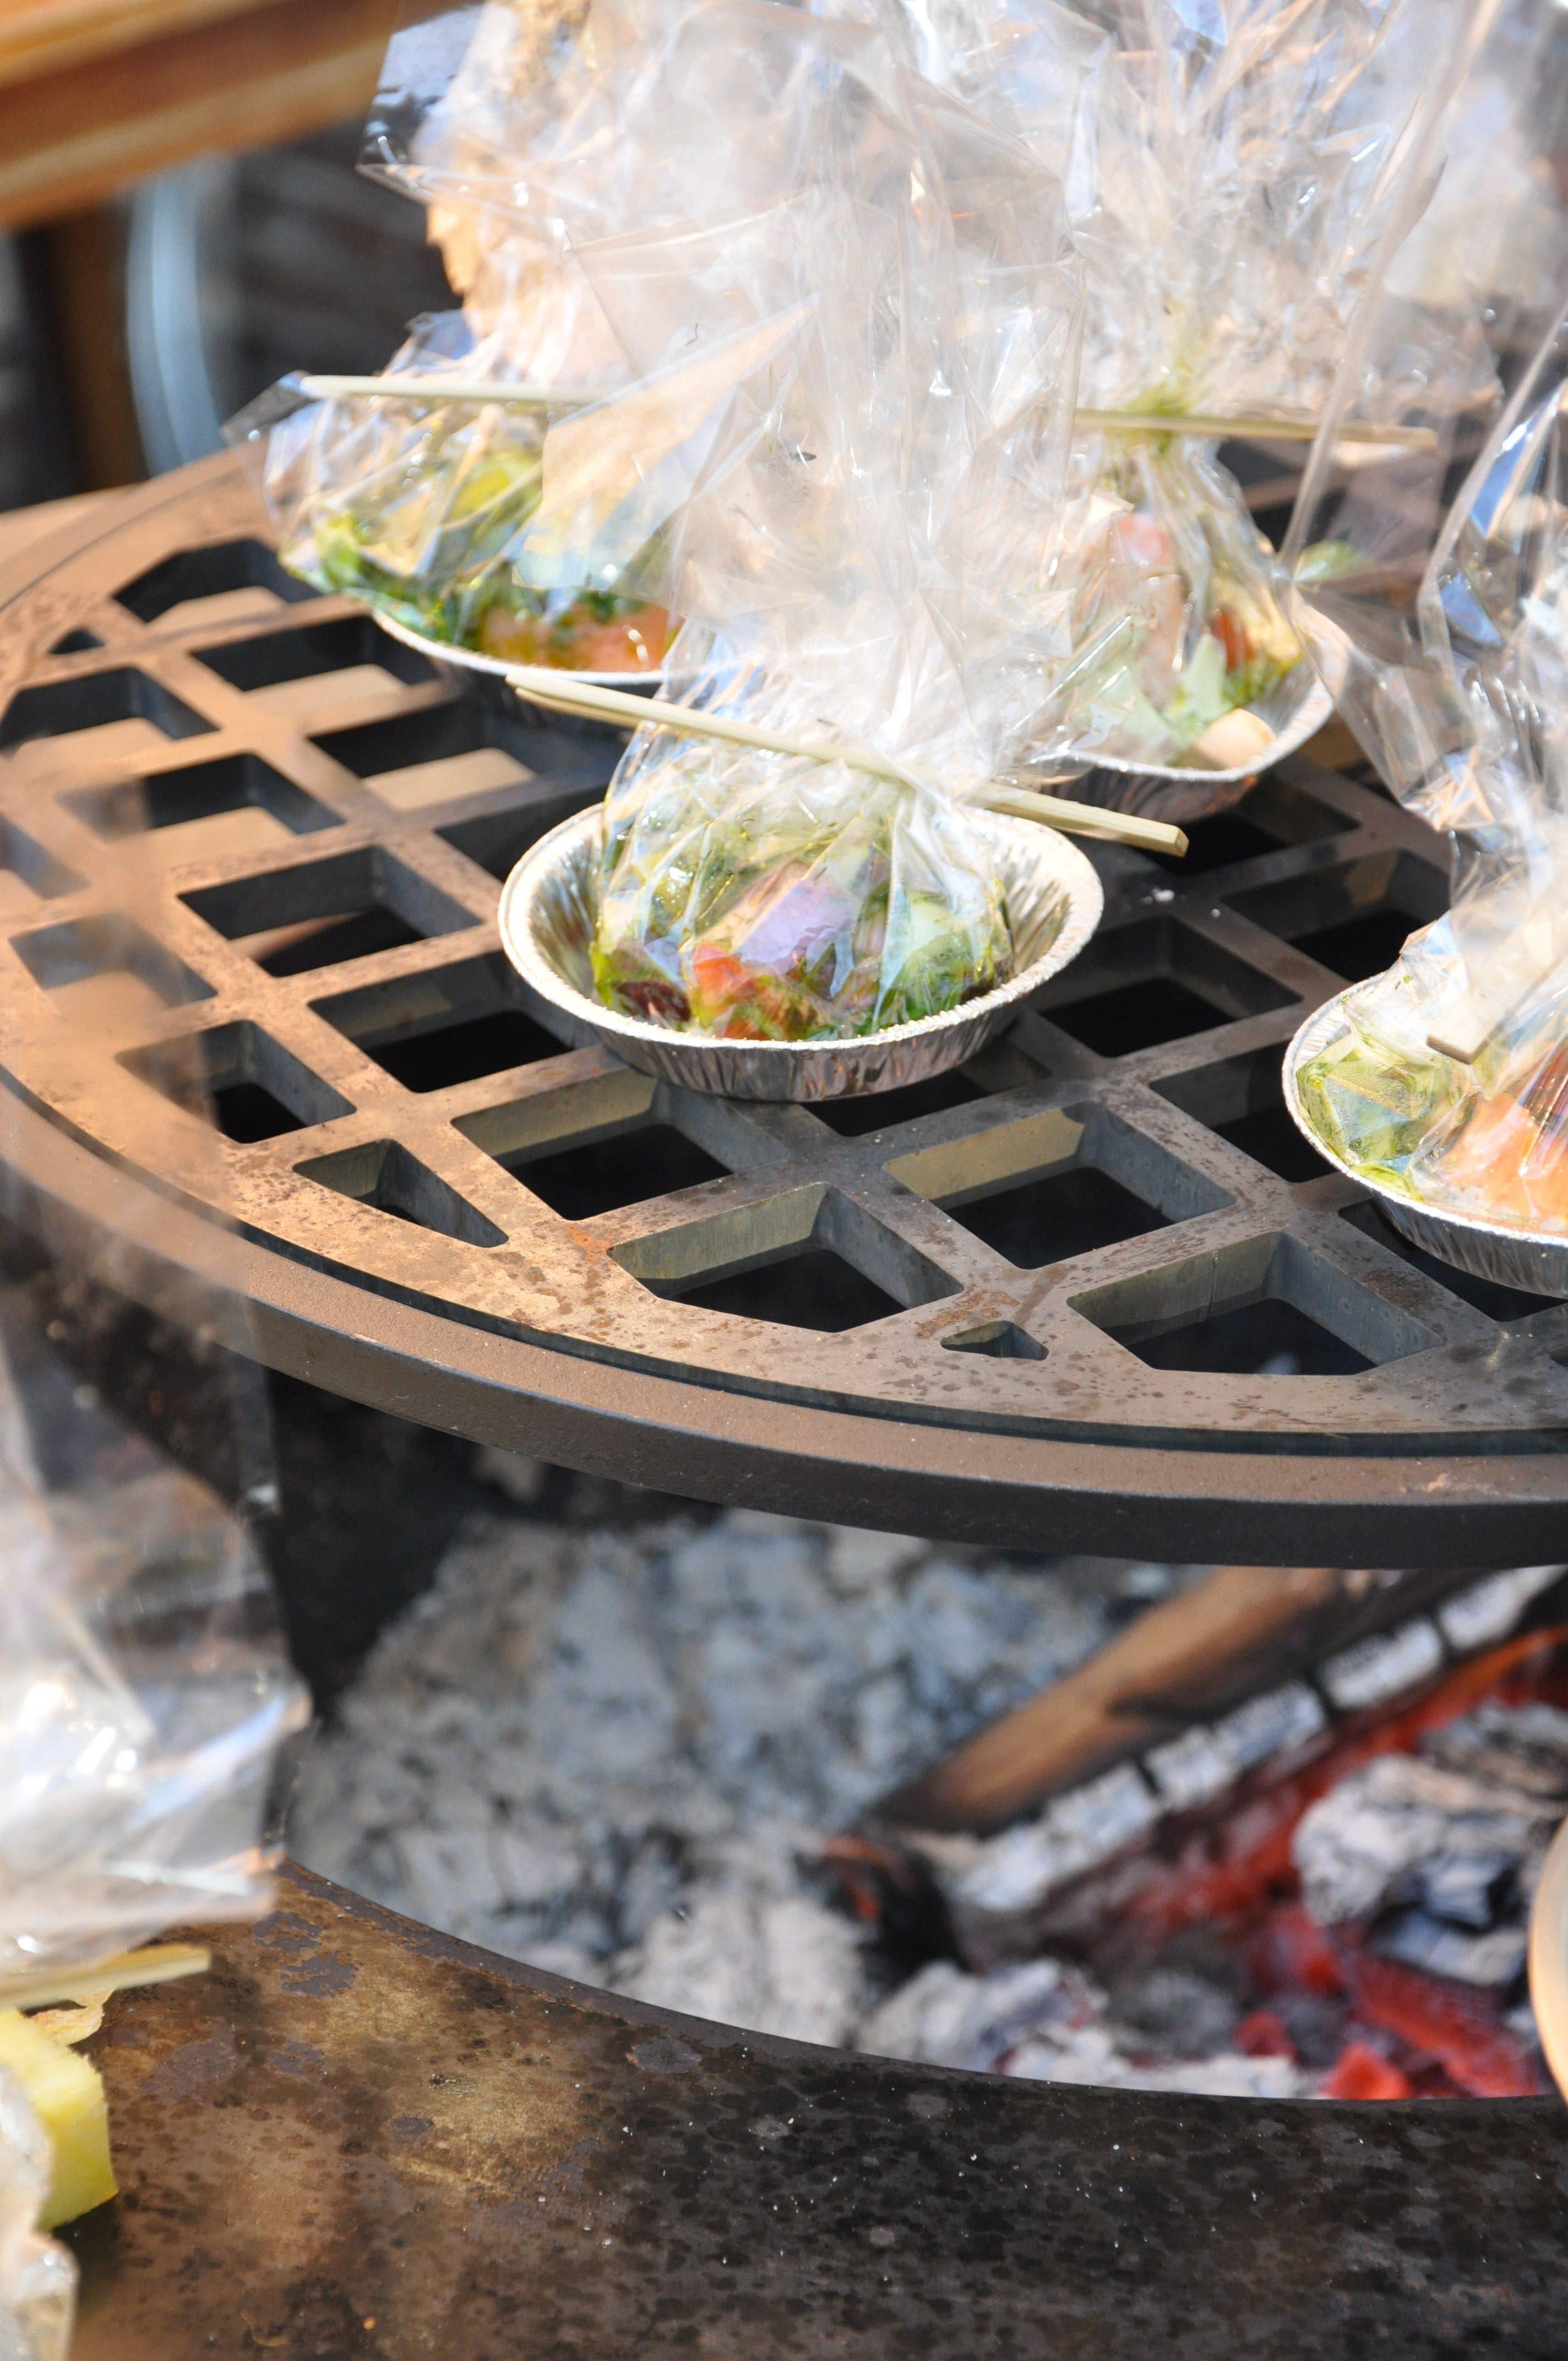 Vaderdag Tip Zomerse Barbecue Als Vaderdag Cadeau Kasteel